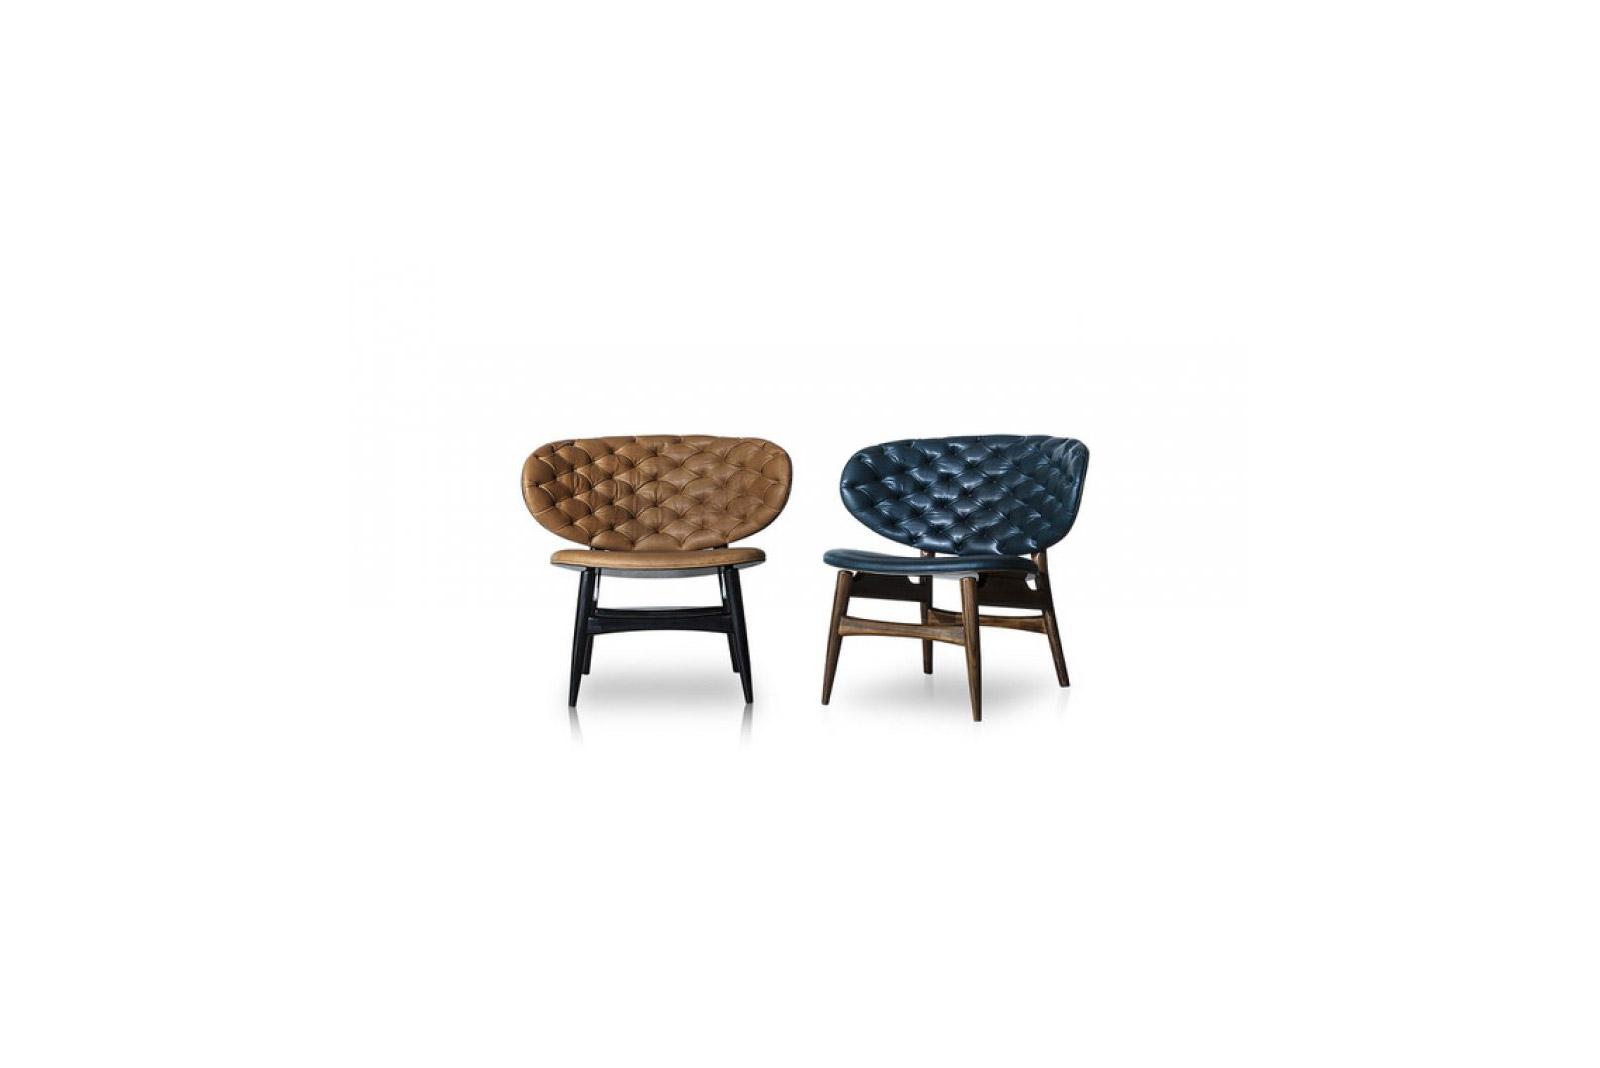 baxter-dalma-armchair-2.jpg